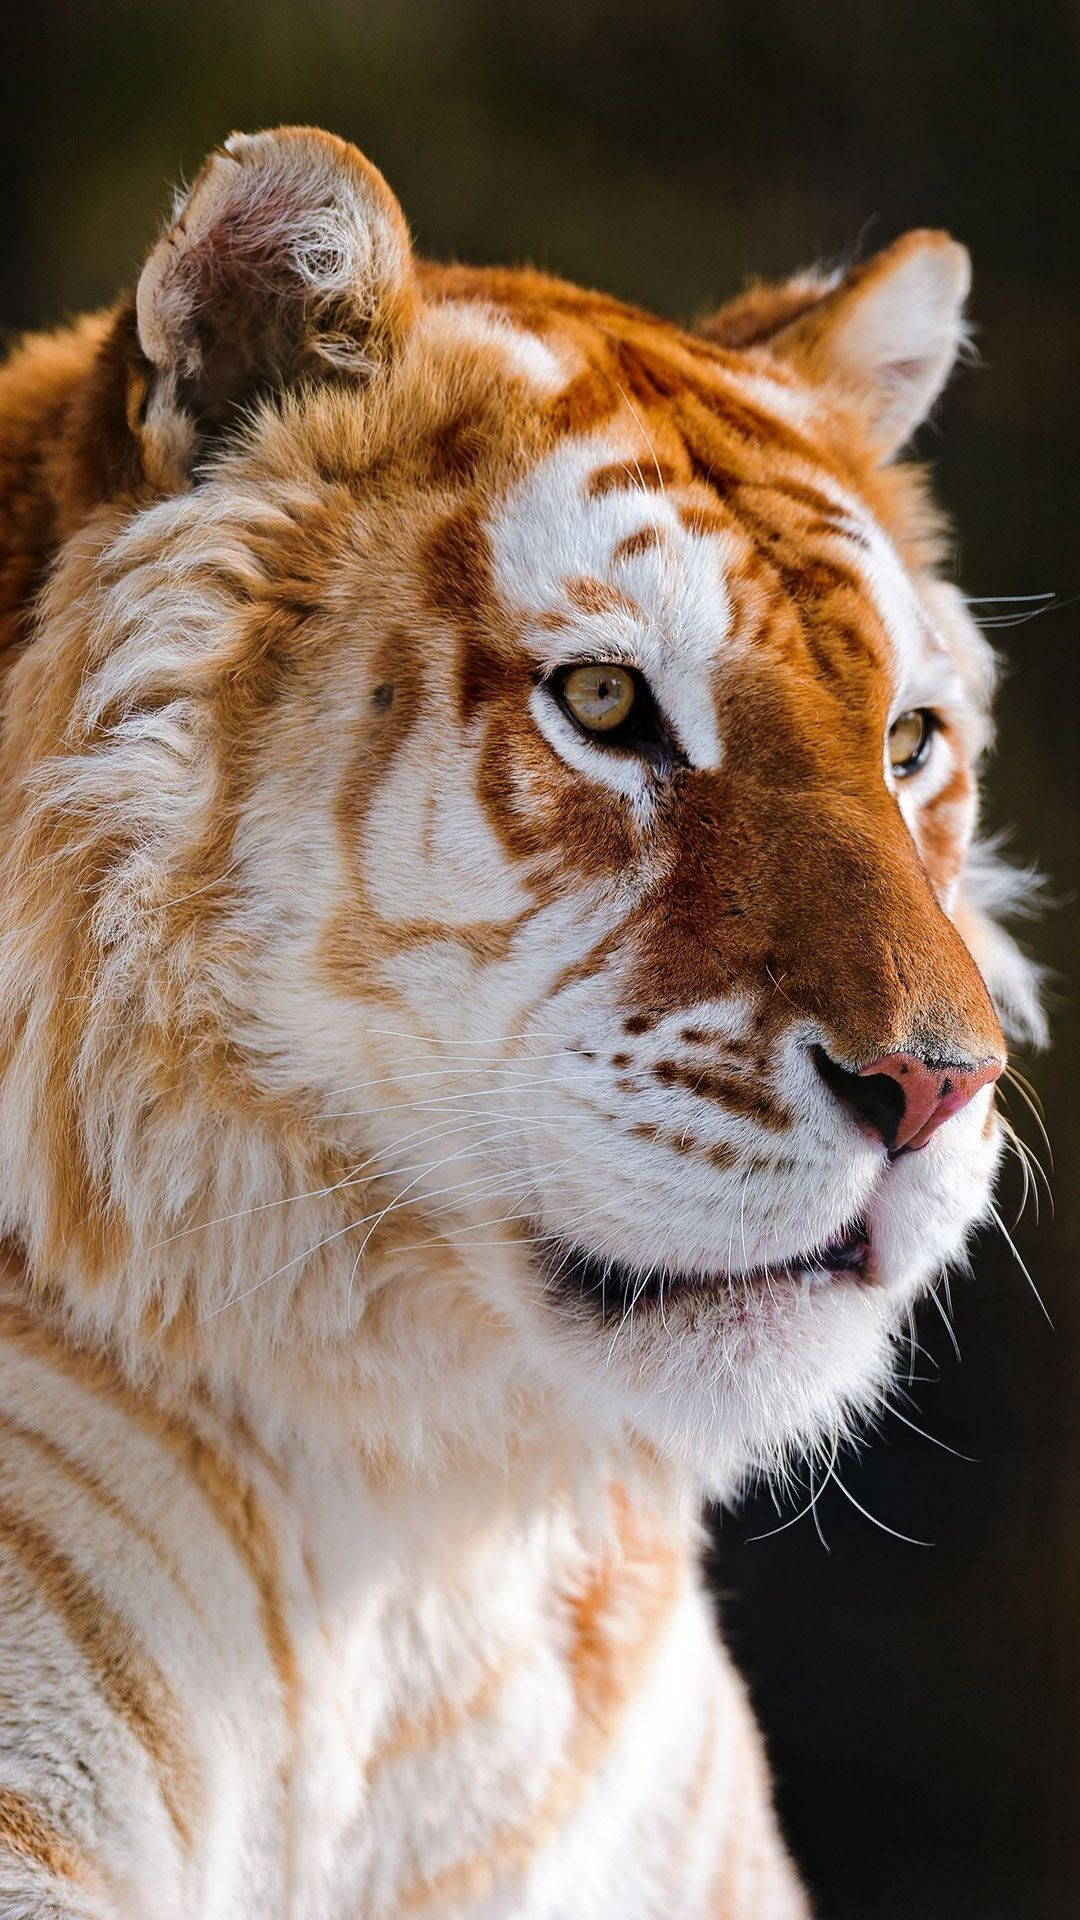 Animals Golden Tiger Orange Cool Cat Awesome